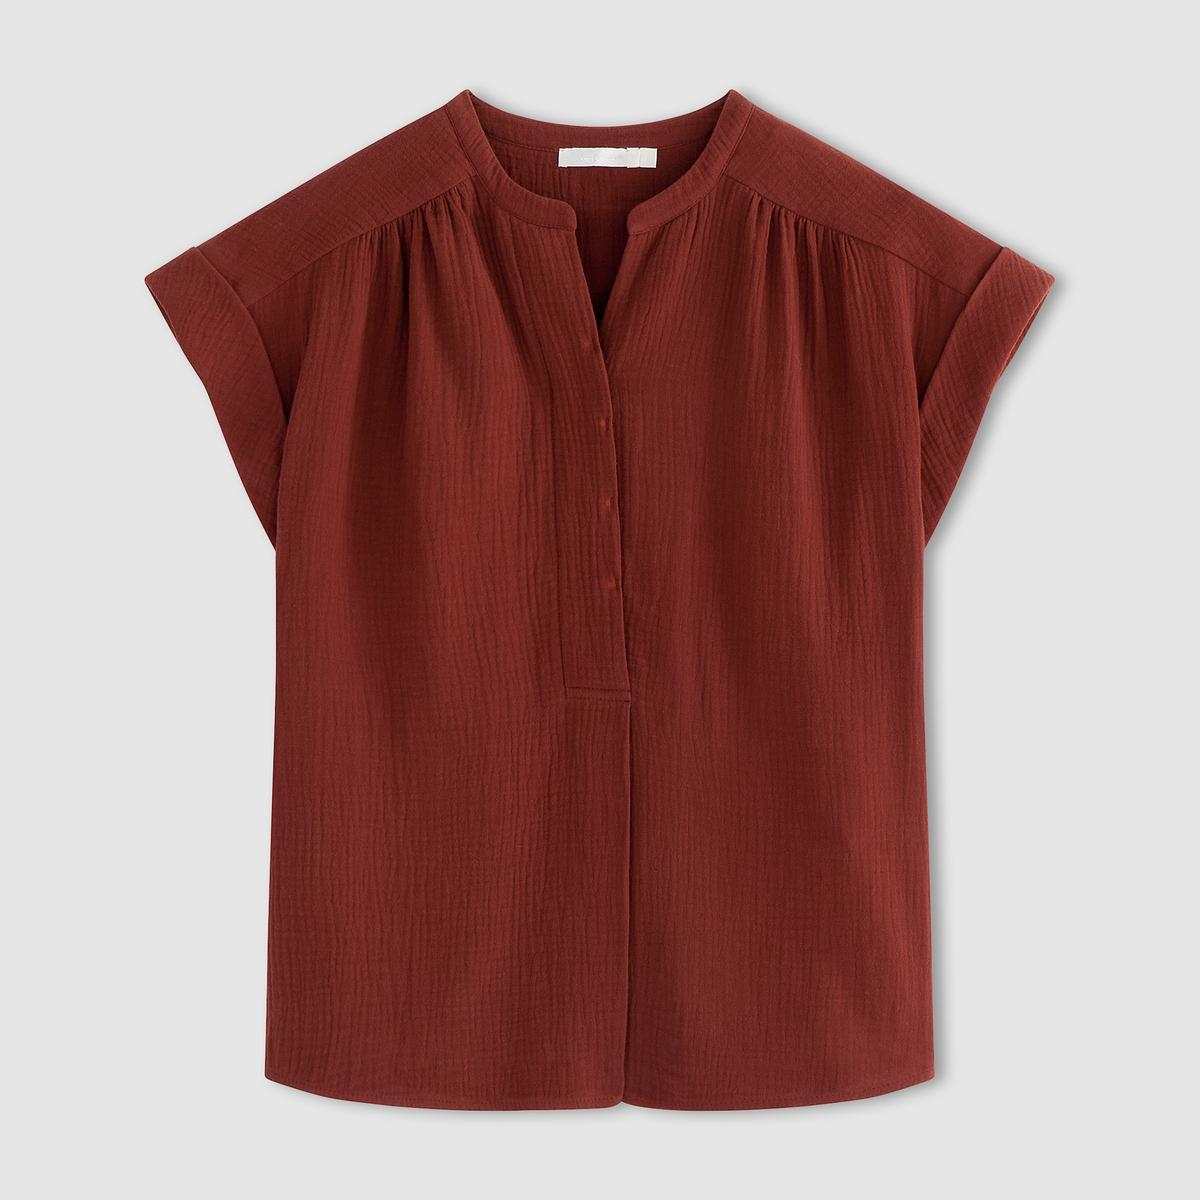 Блузка, 100% хлопка